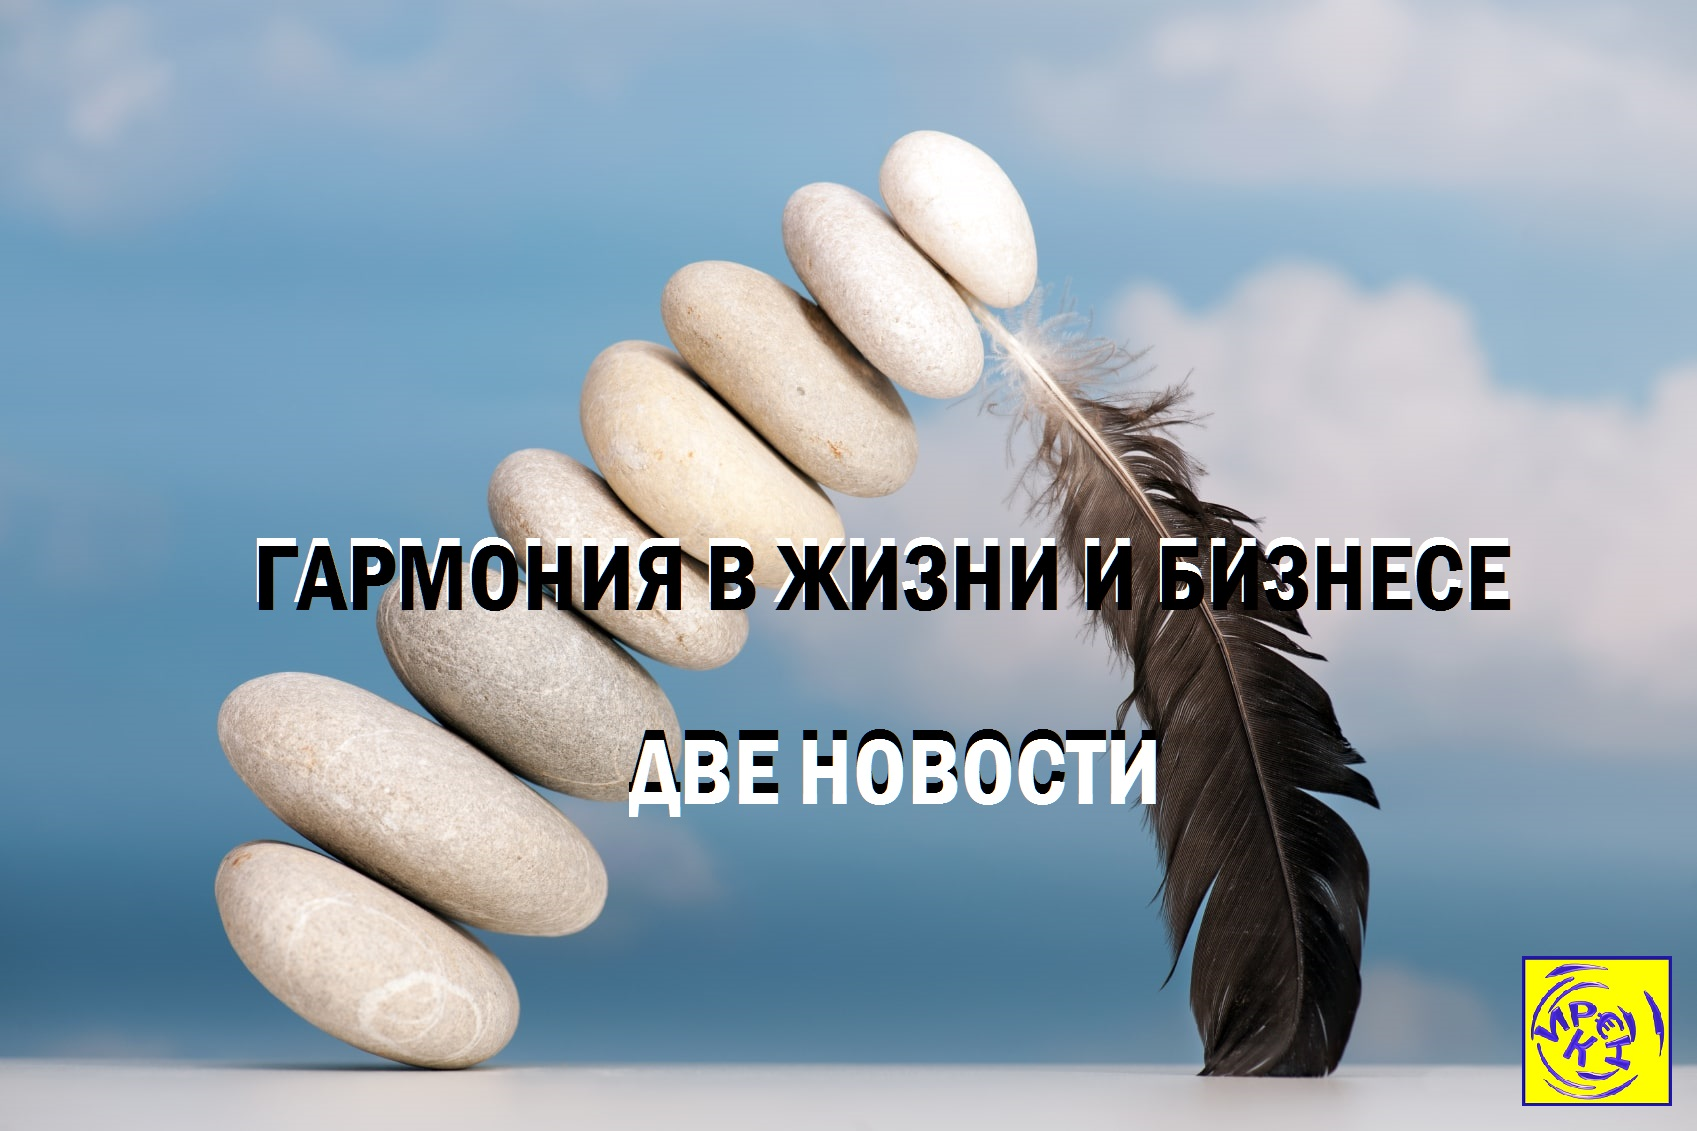 камни, Всего две новости. Да, какие! Гармония в Жизни и Бизнесе. Ирина Кириковская